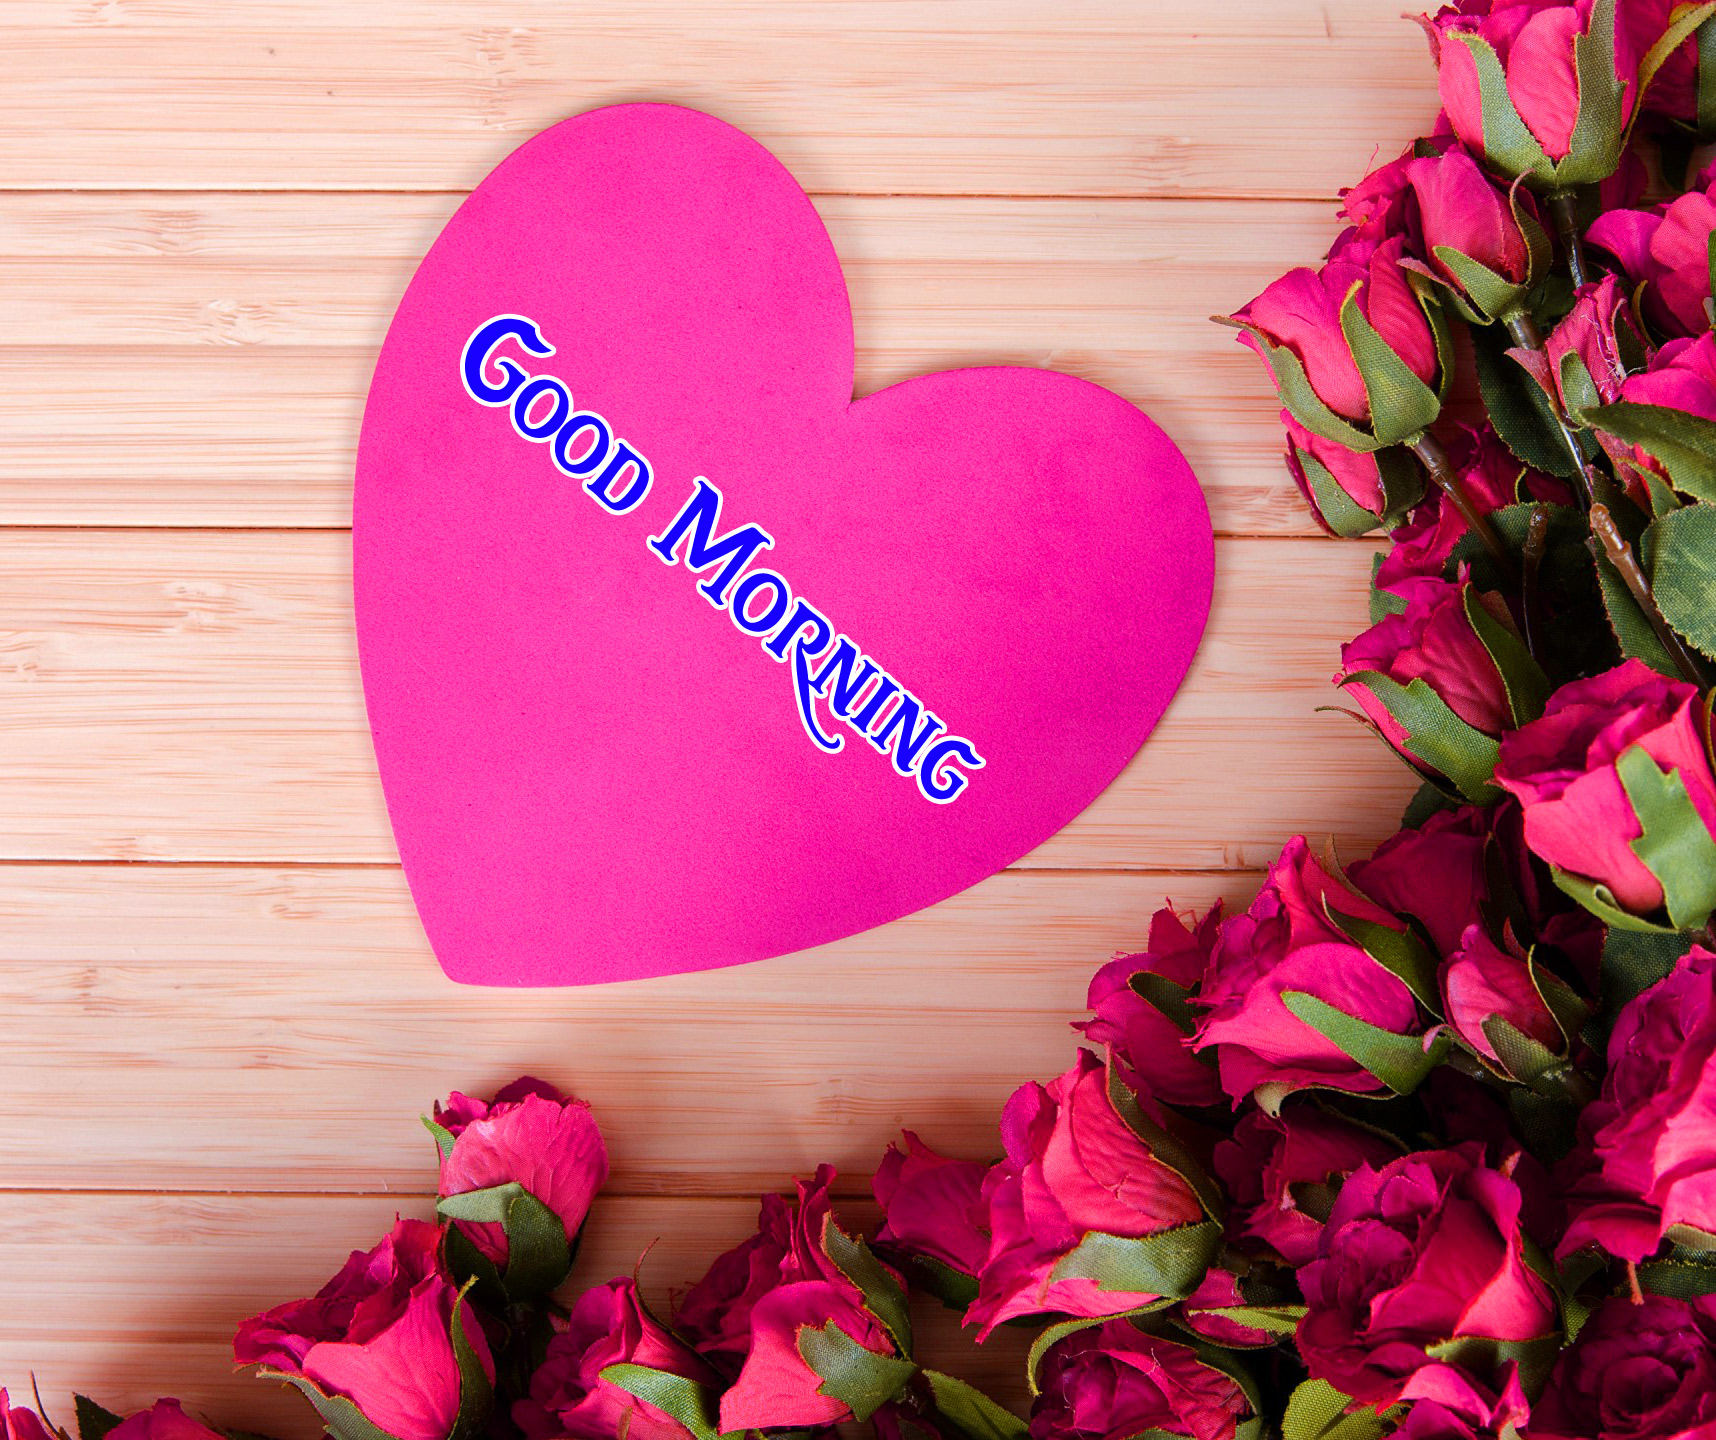 Good Morning Pics 27